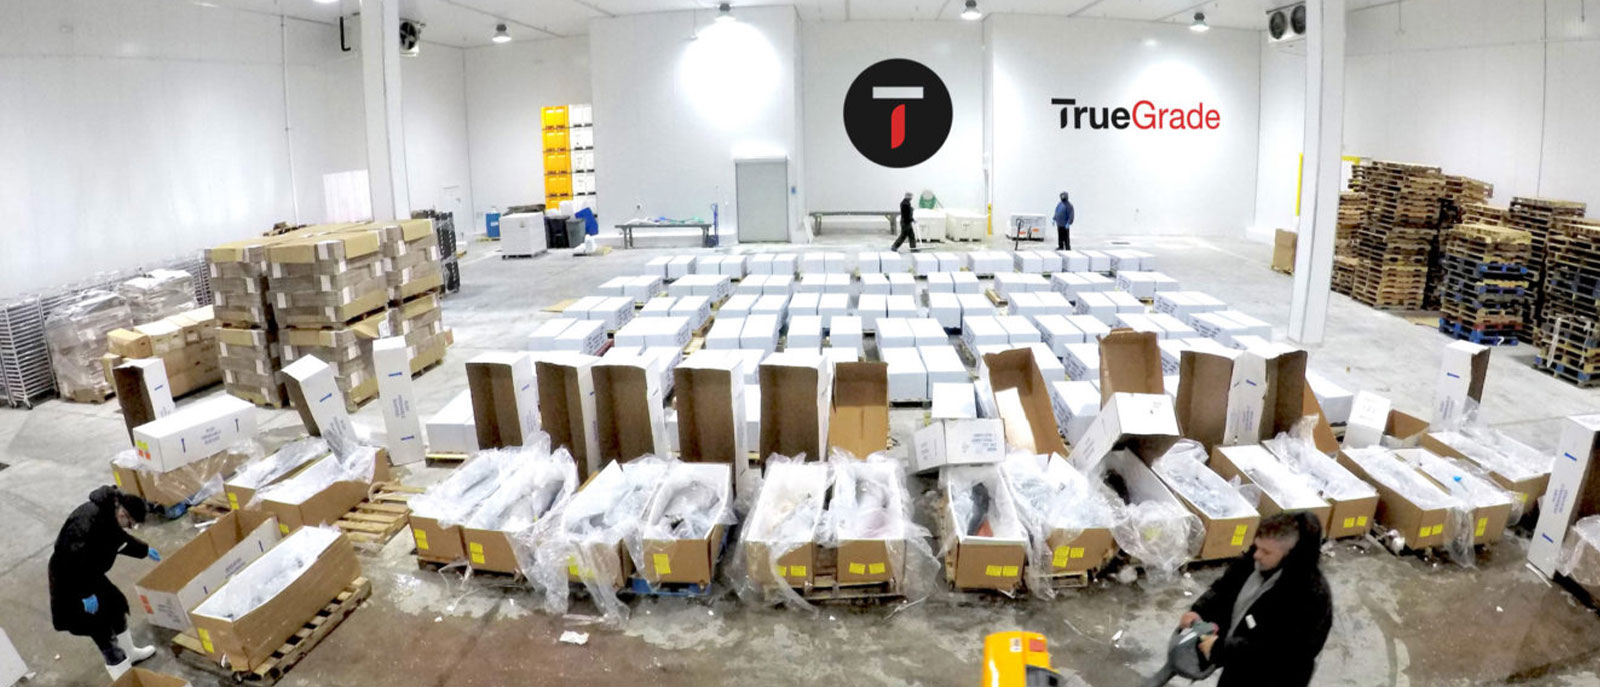 True-Grade-Fresh-Warehouse